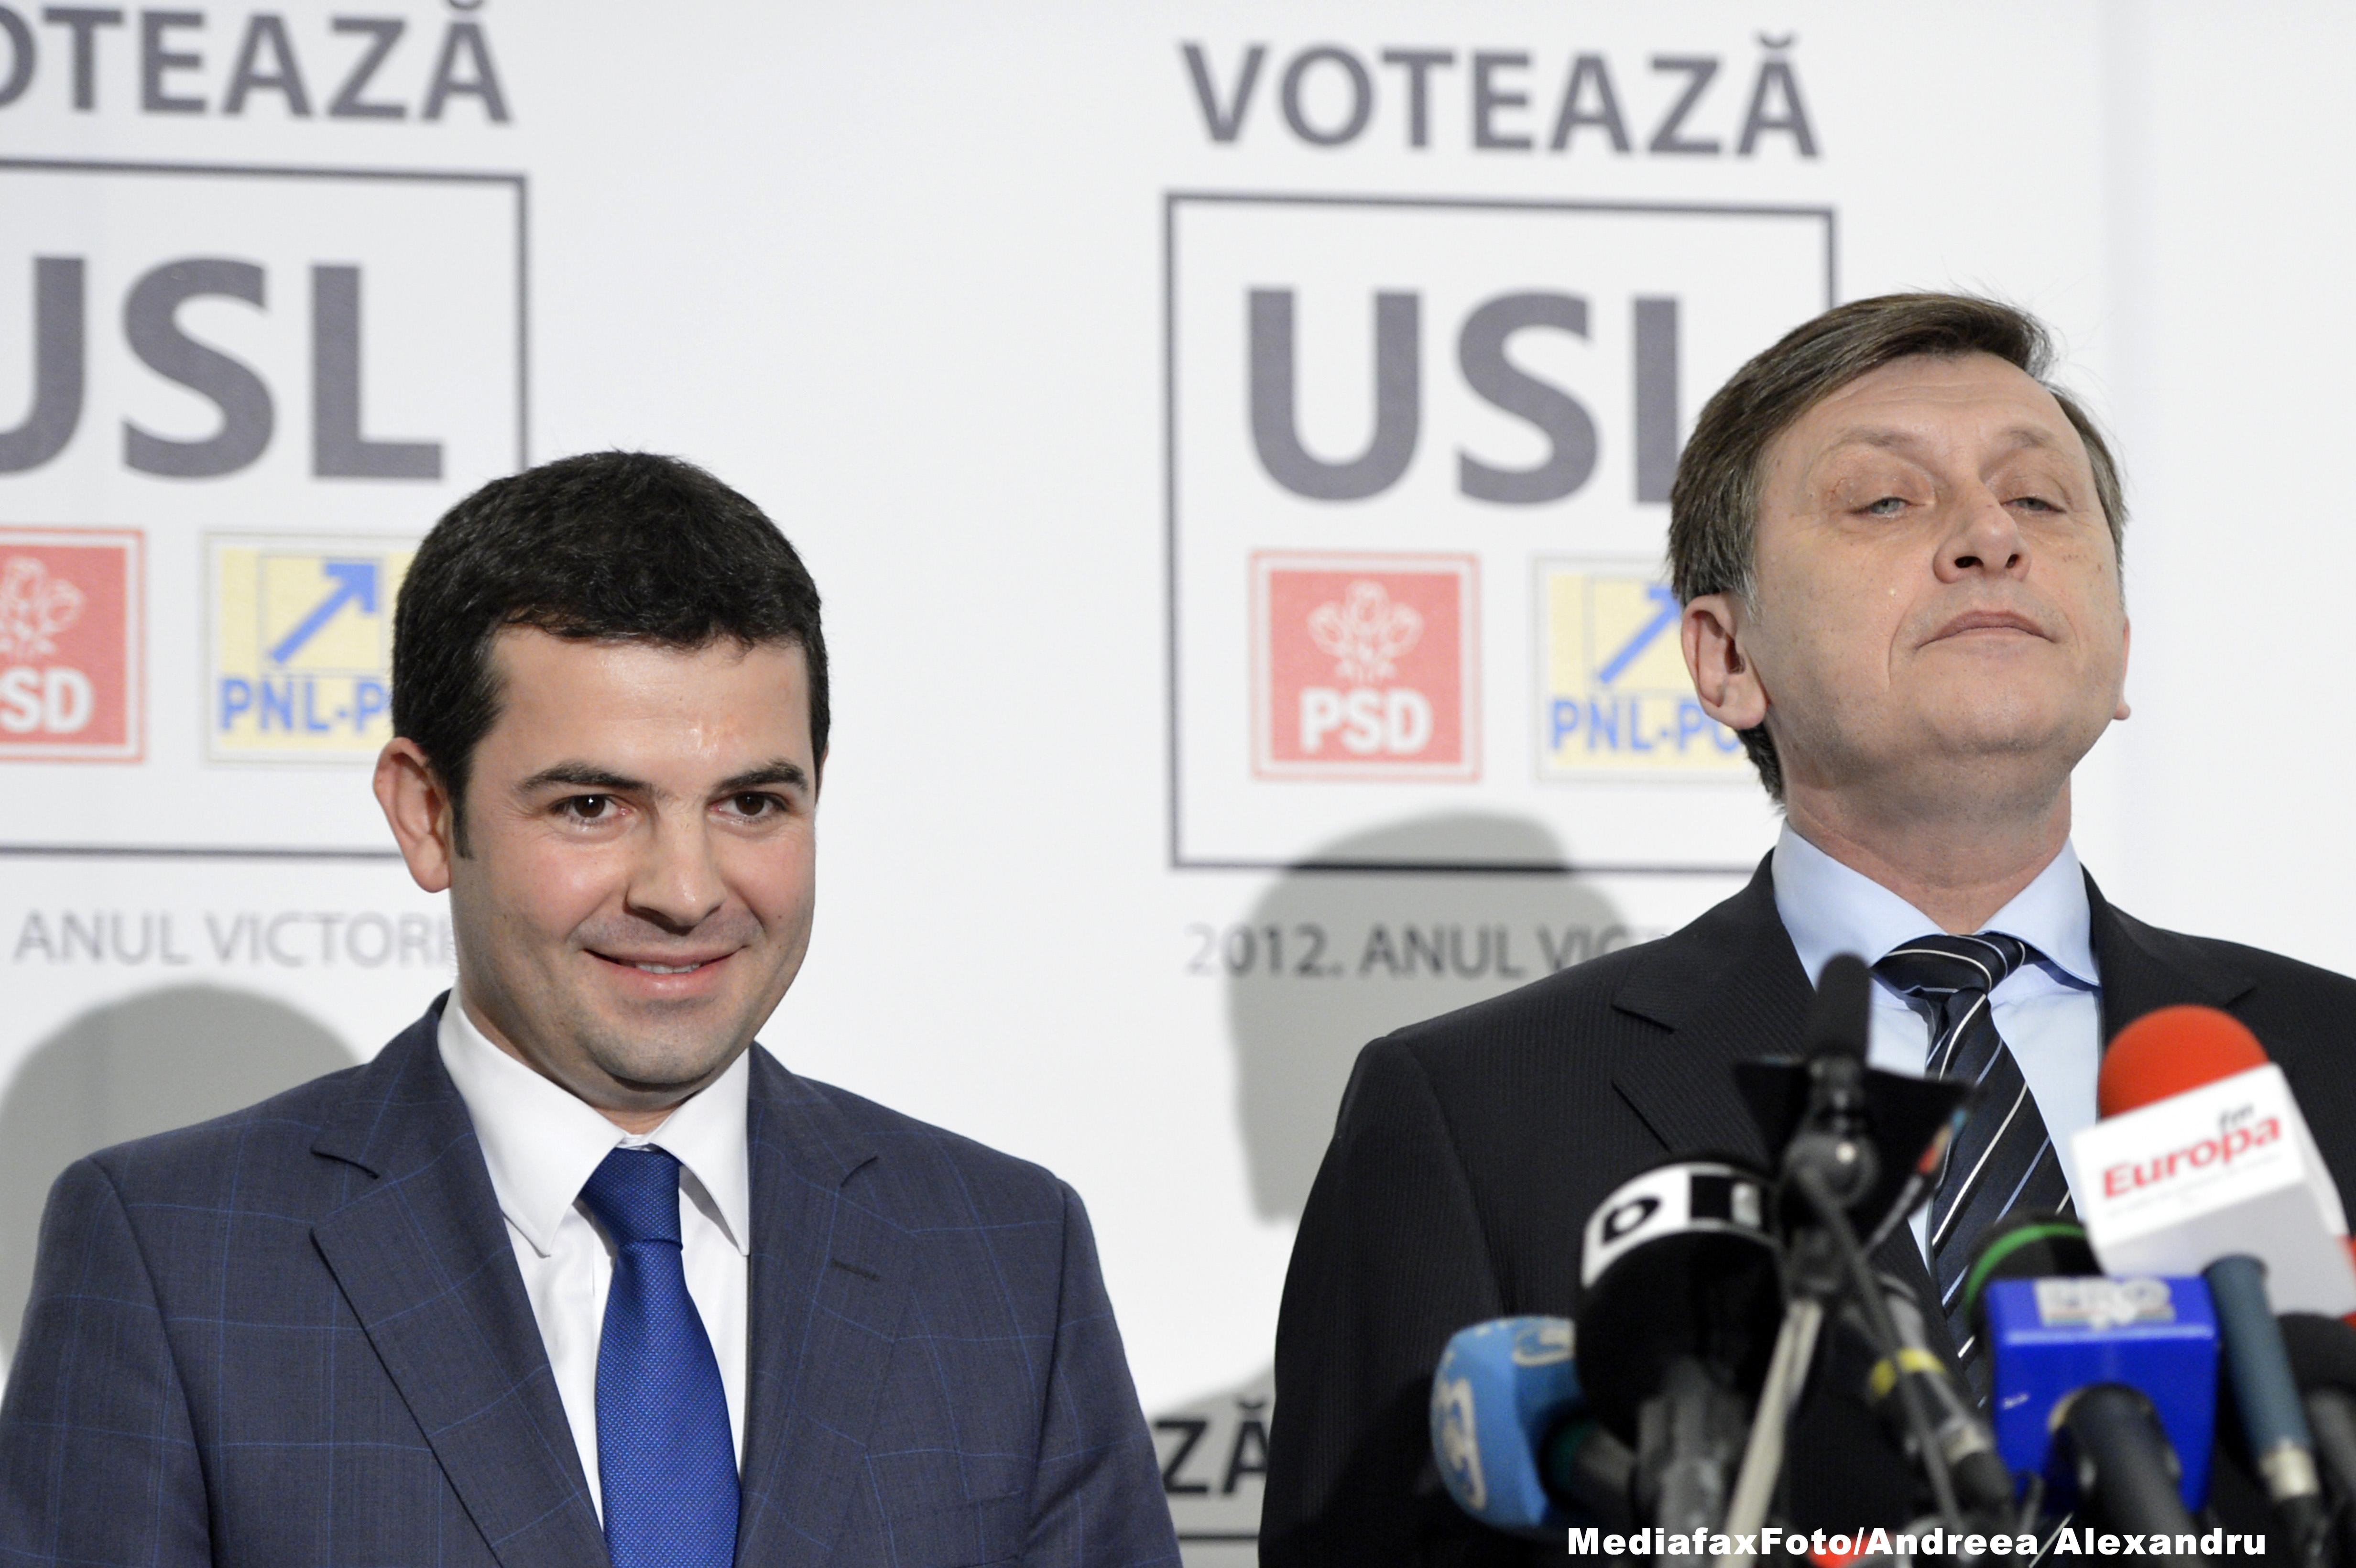 Crin Antonescu: Te rade lumea. Cum sa te impaci cu Daniel Constantin? Nu e cazul